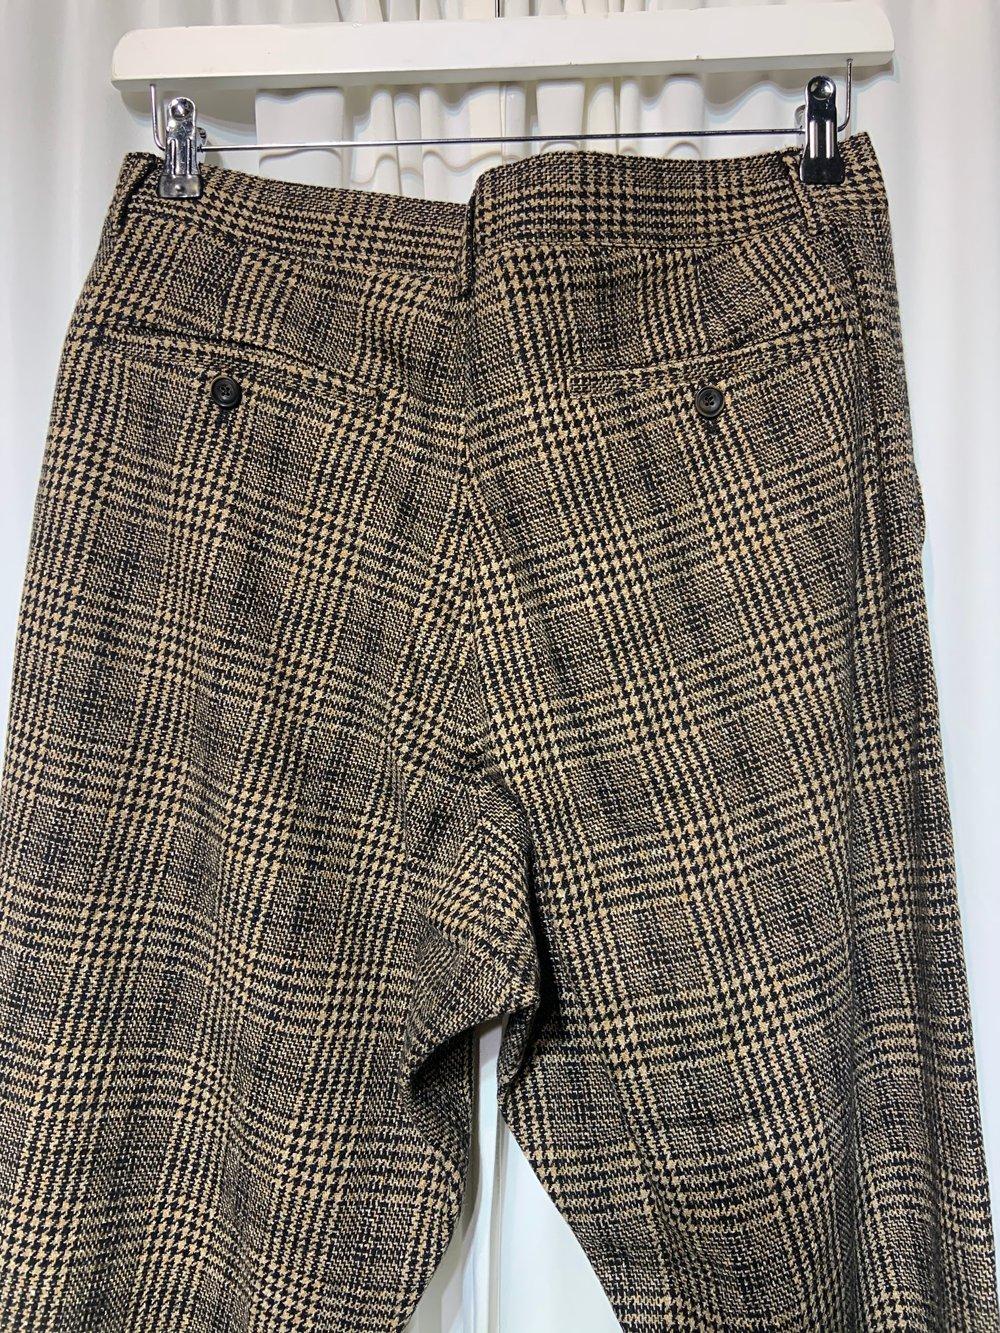 Hansen Garments Chekered Ken